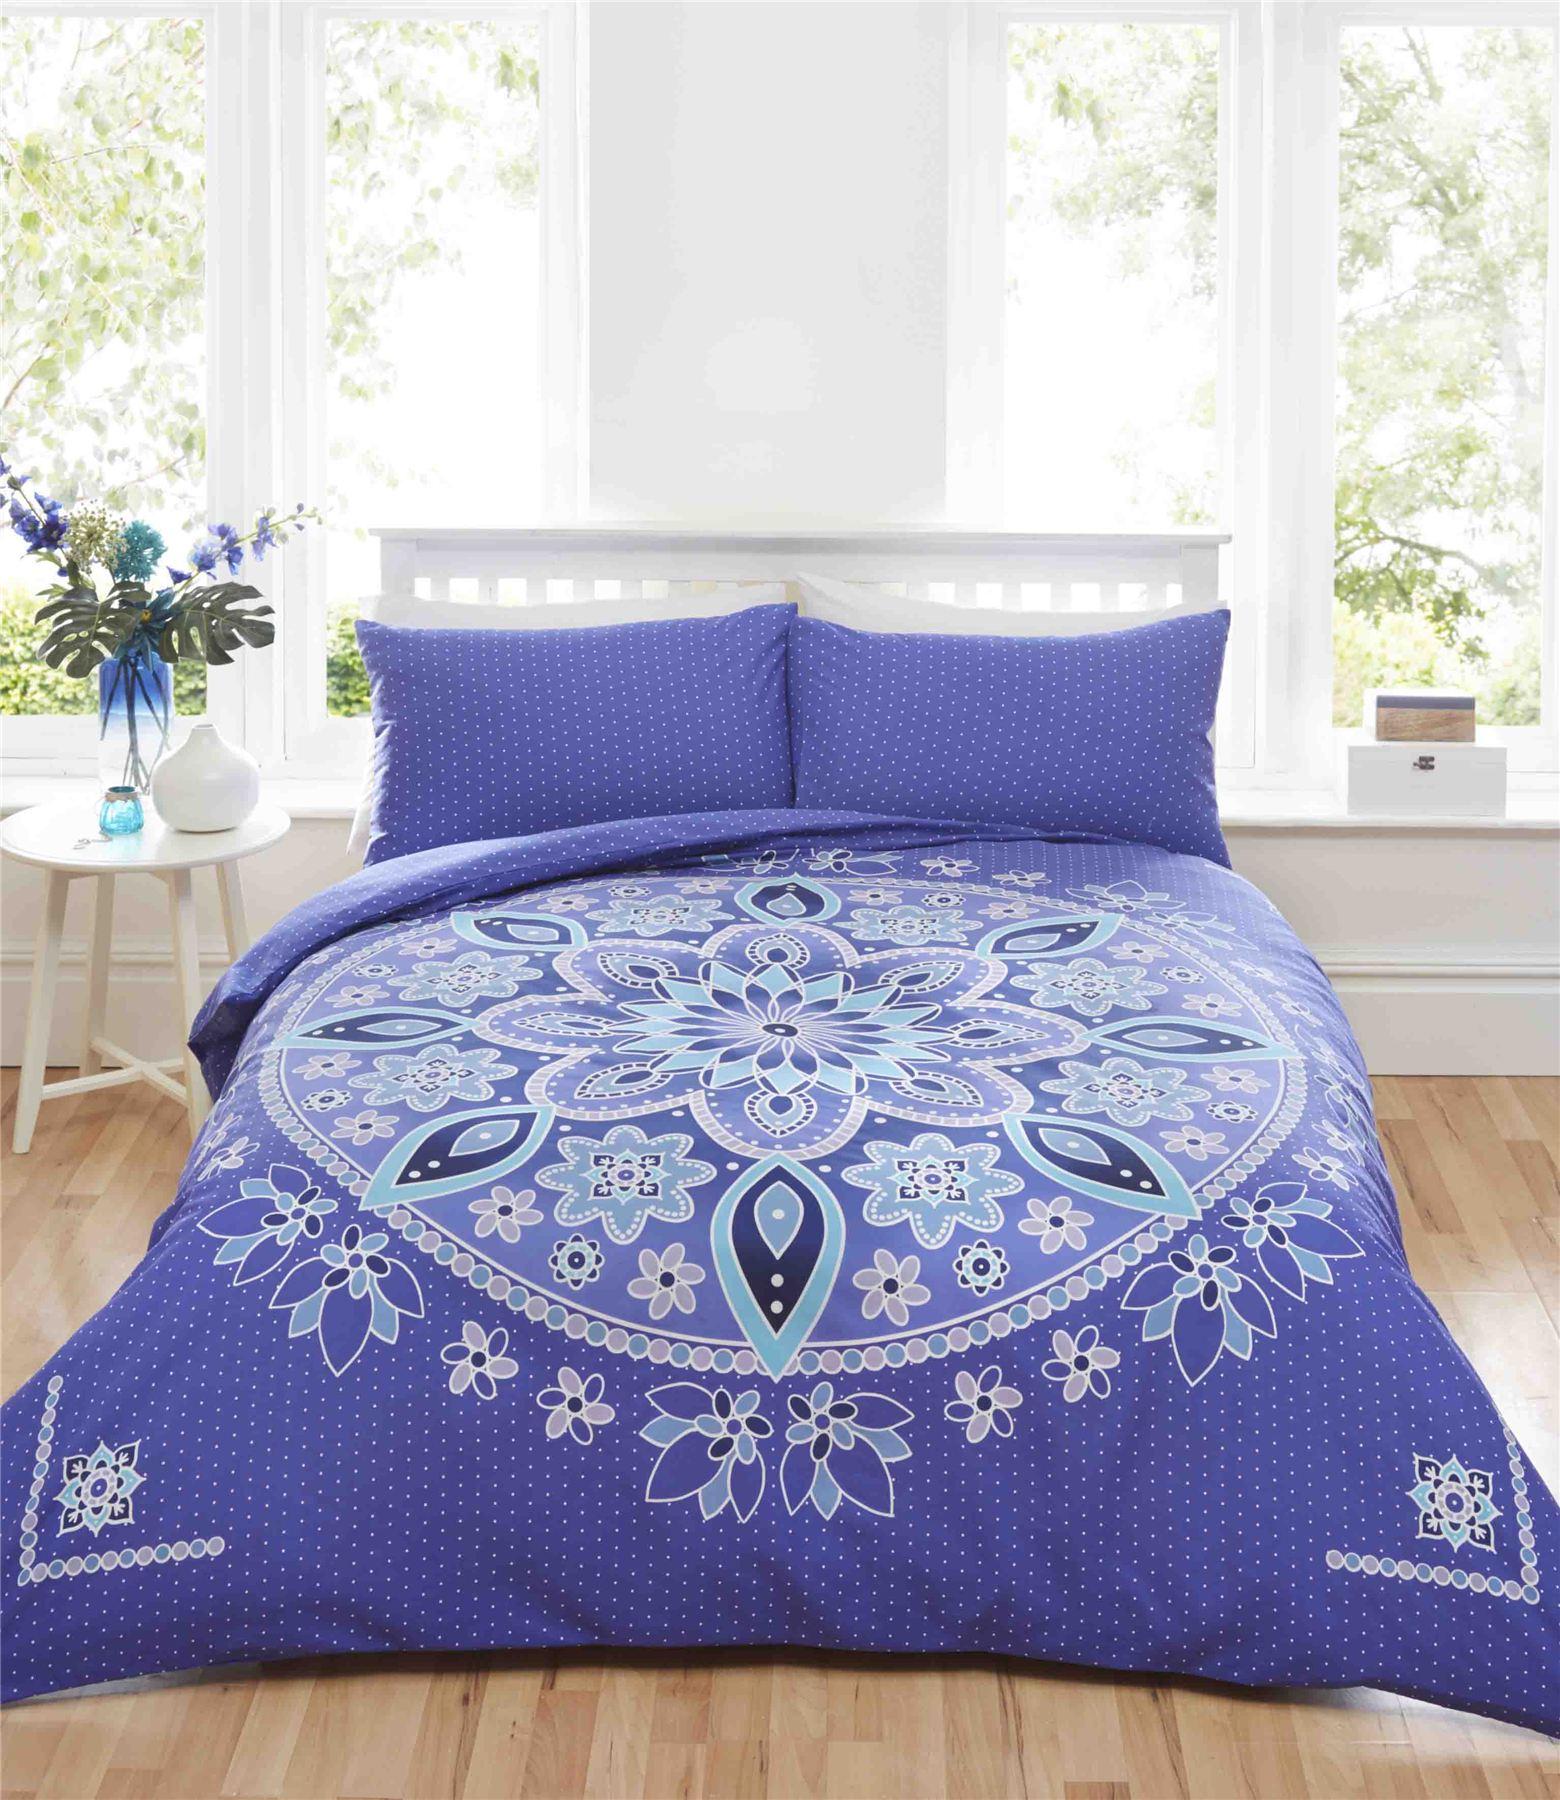 indian style elephant quilt duvet cover pillowcase. Black Bedroom Furniture Sets. Home Design Ideas